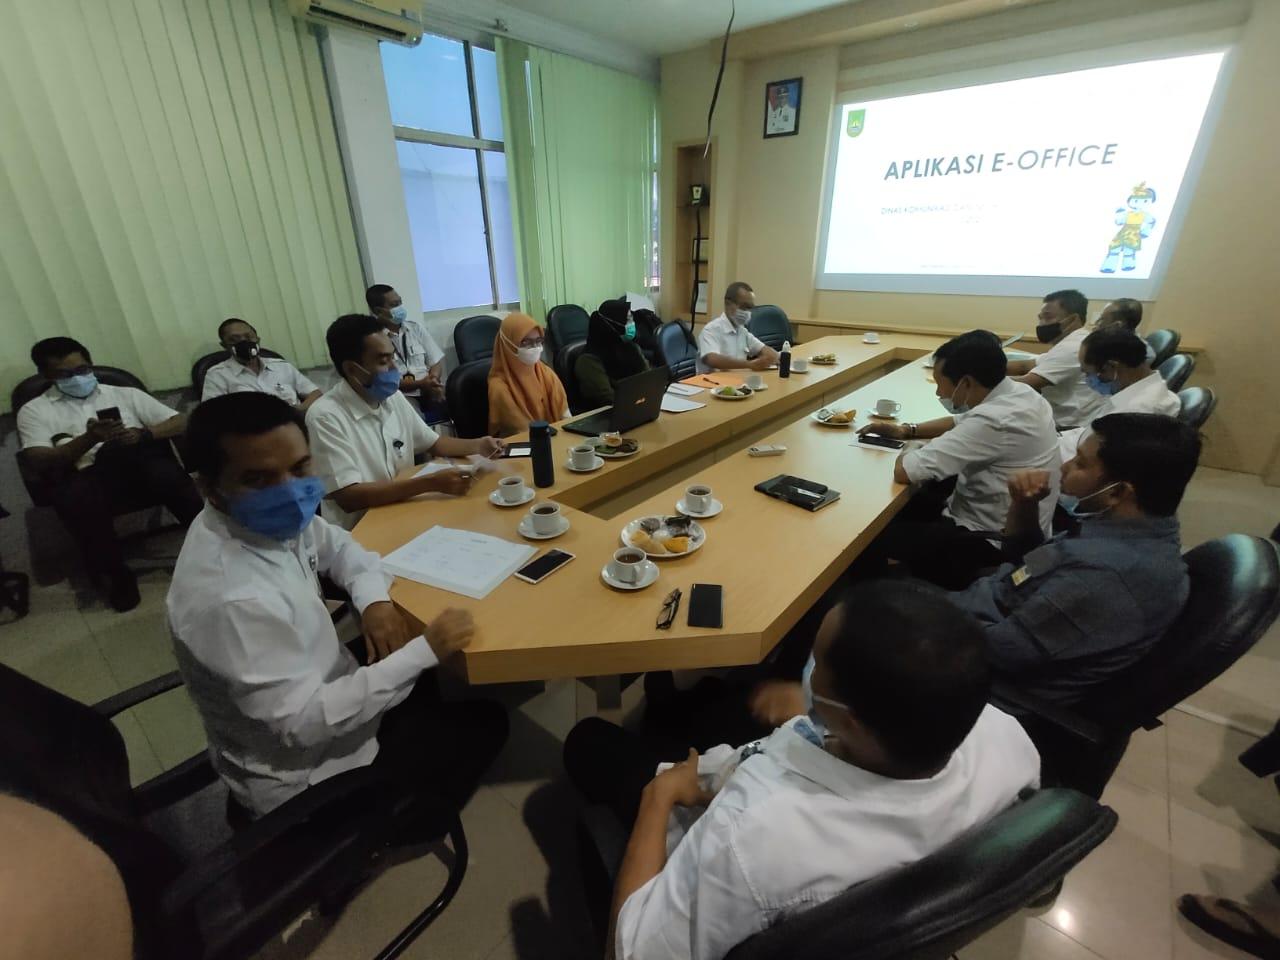 Sosialisasi e-Office di Dinas Lingkungan Hidup Kota Batam